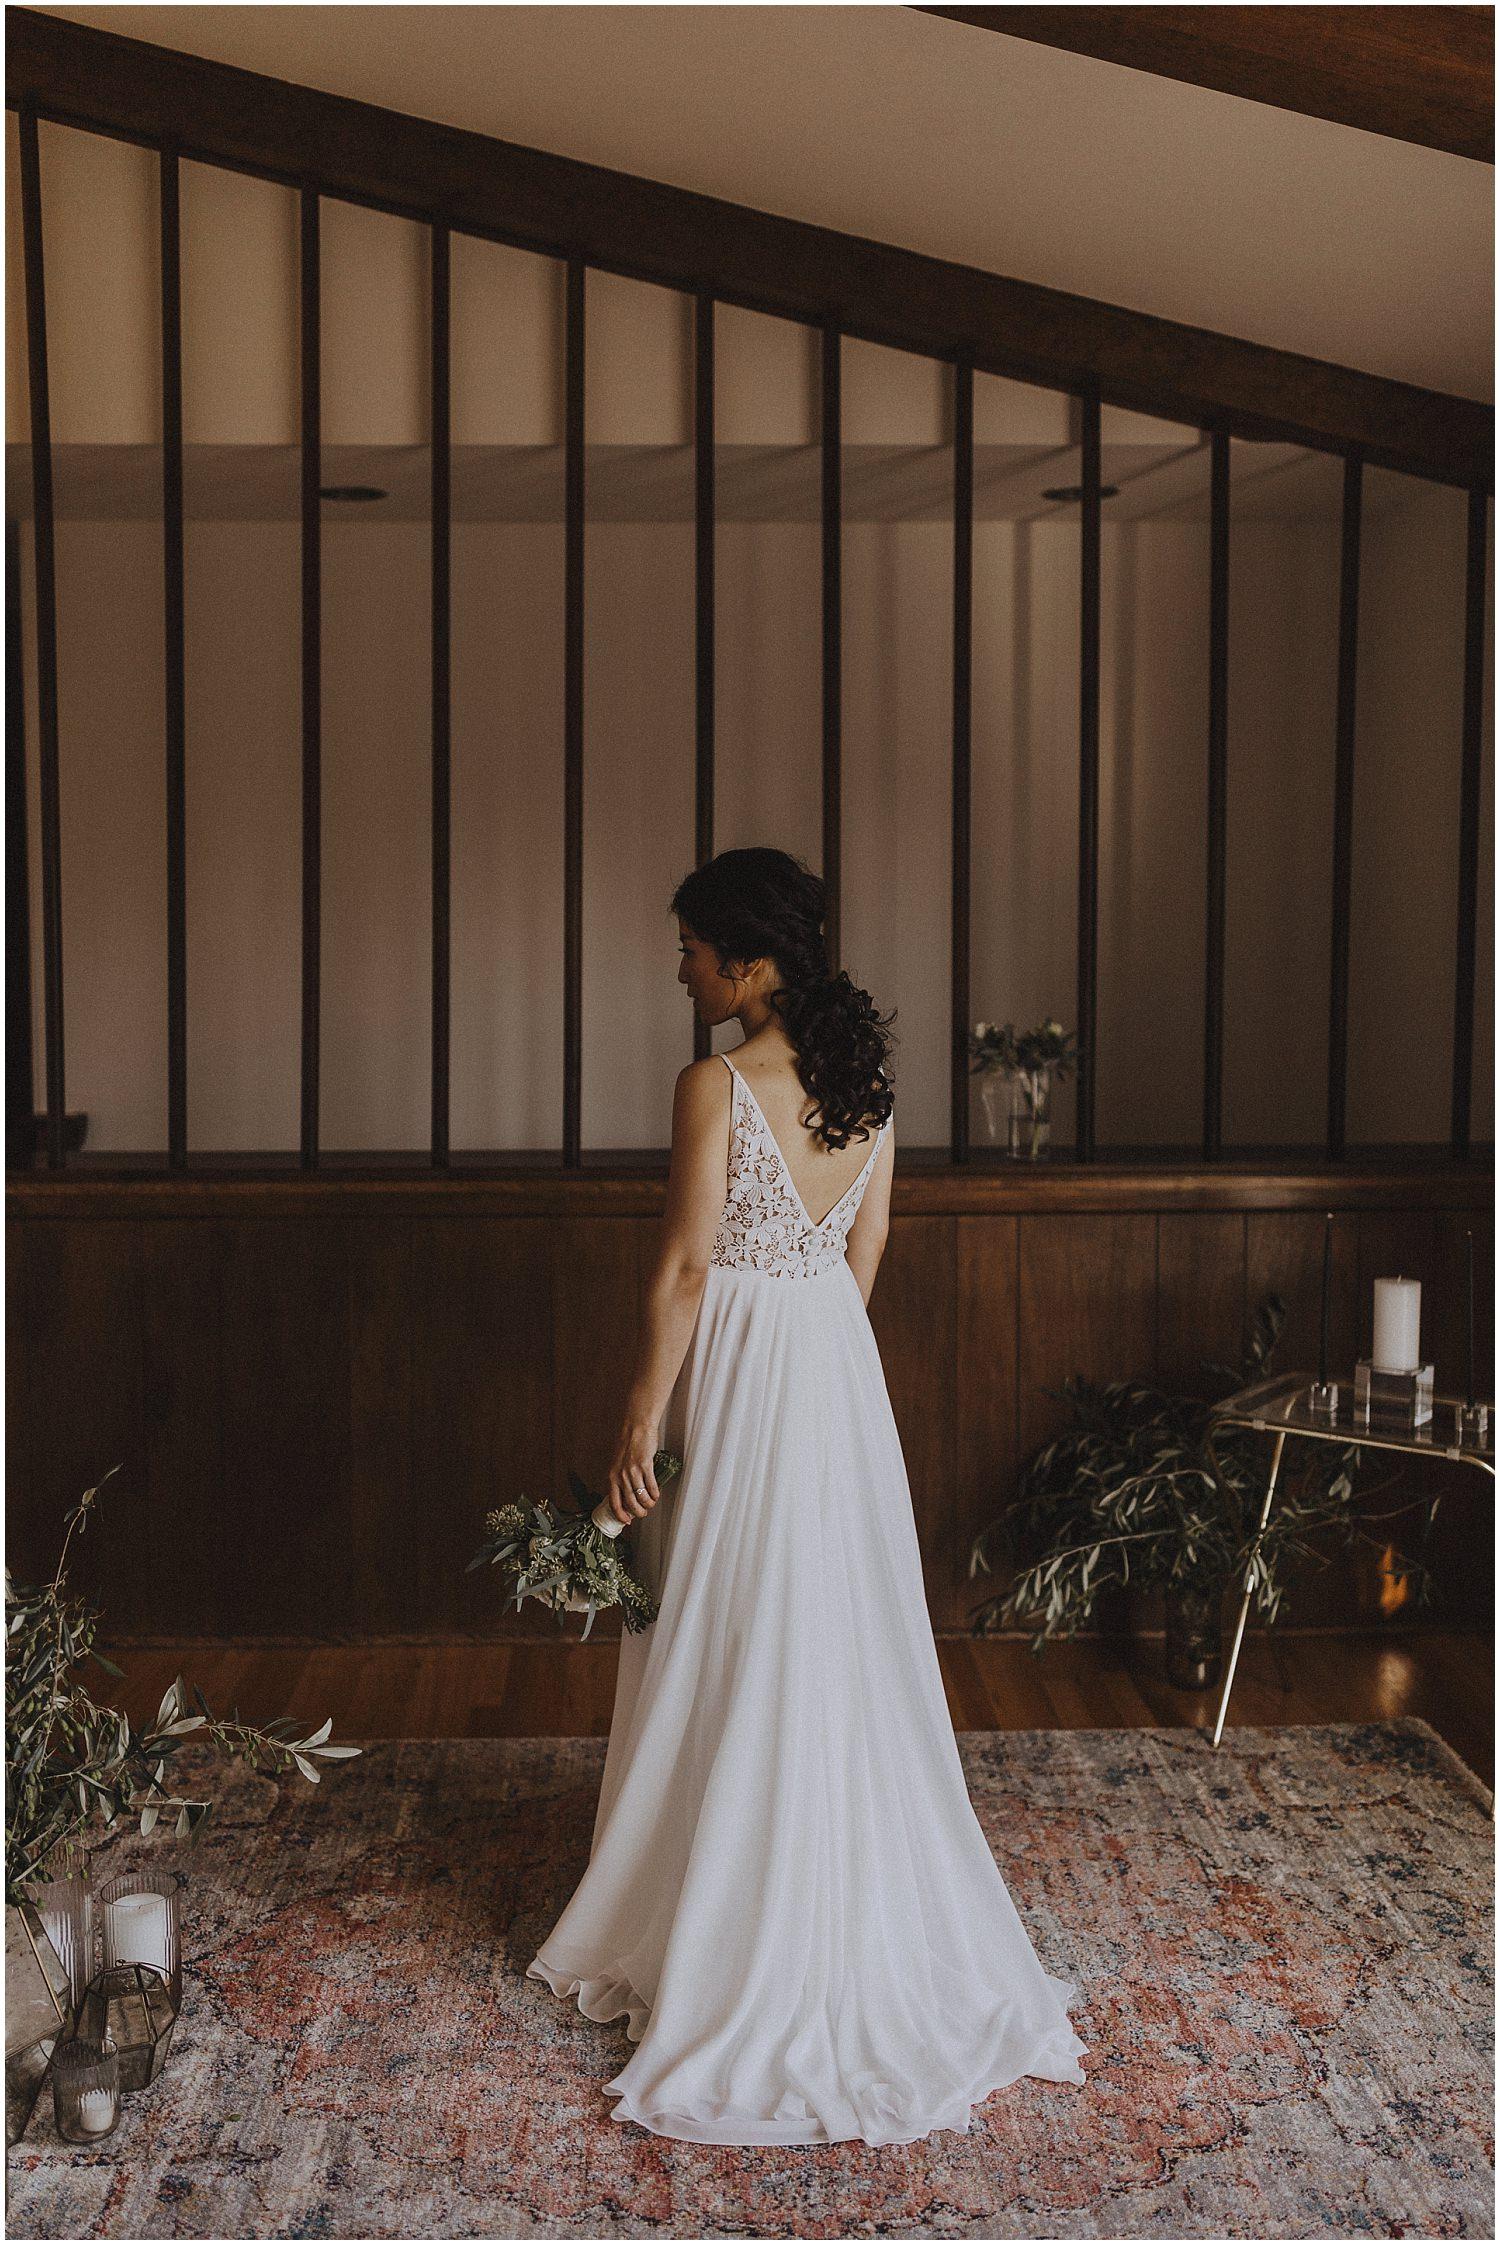 Bride standing with bouquet in her hands Chicago wedding photographer kyle szeto